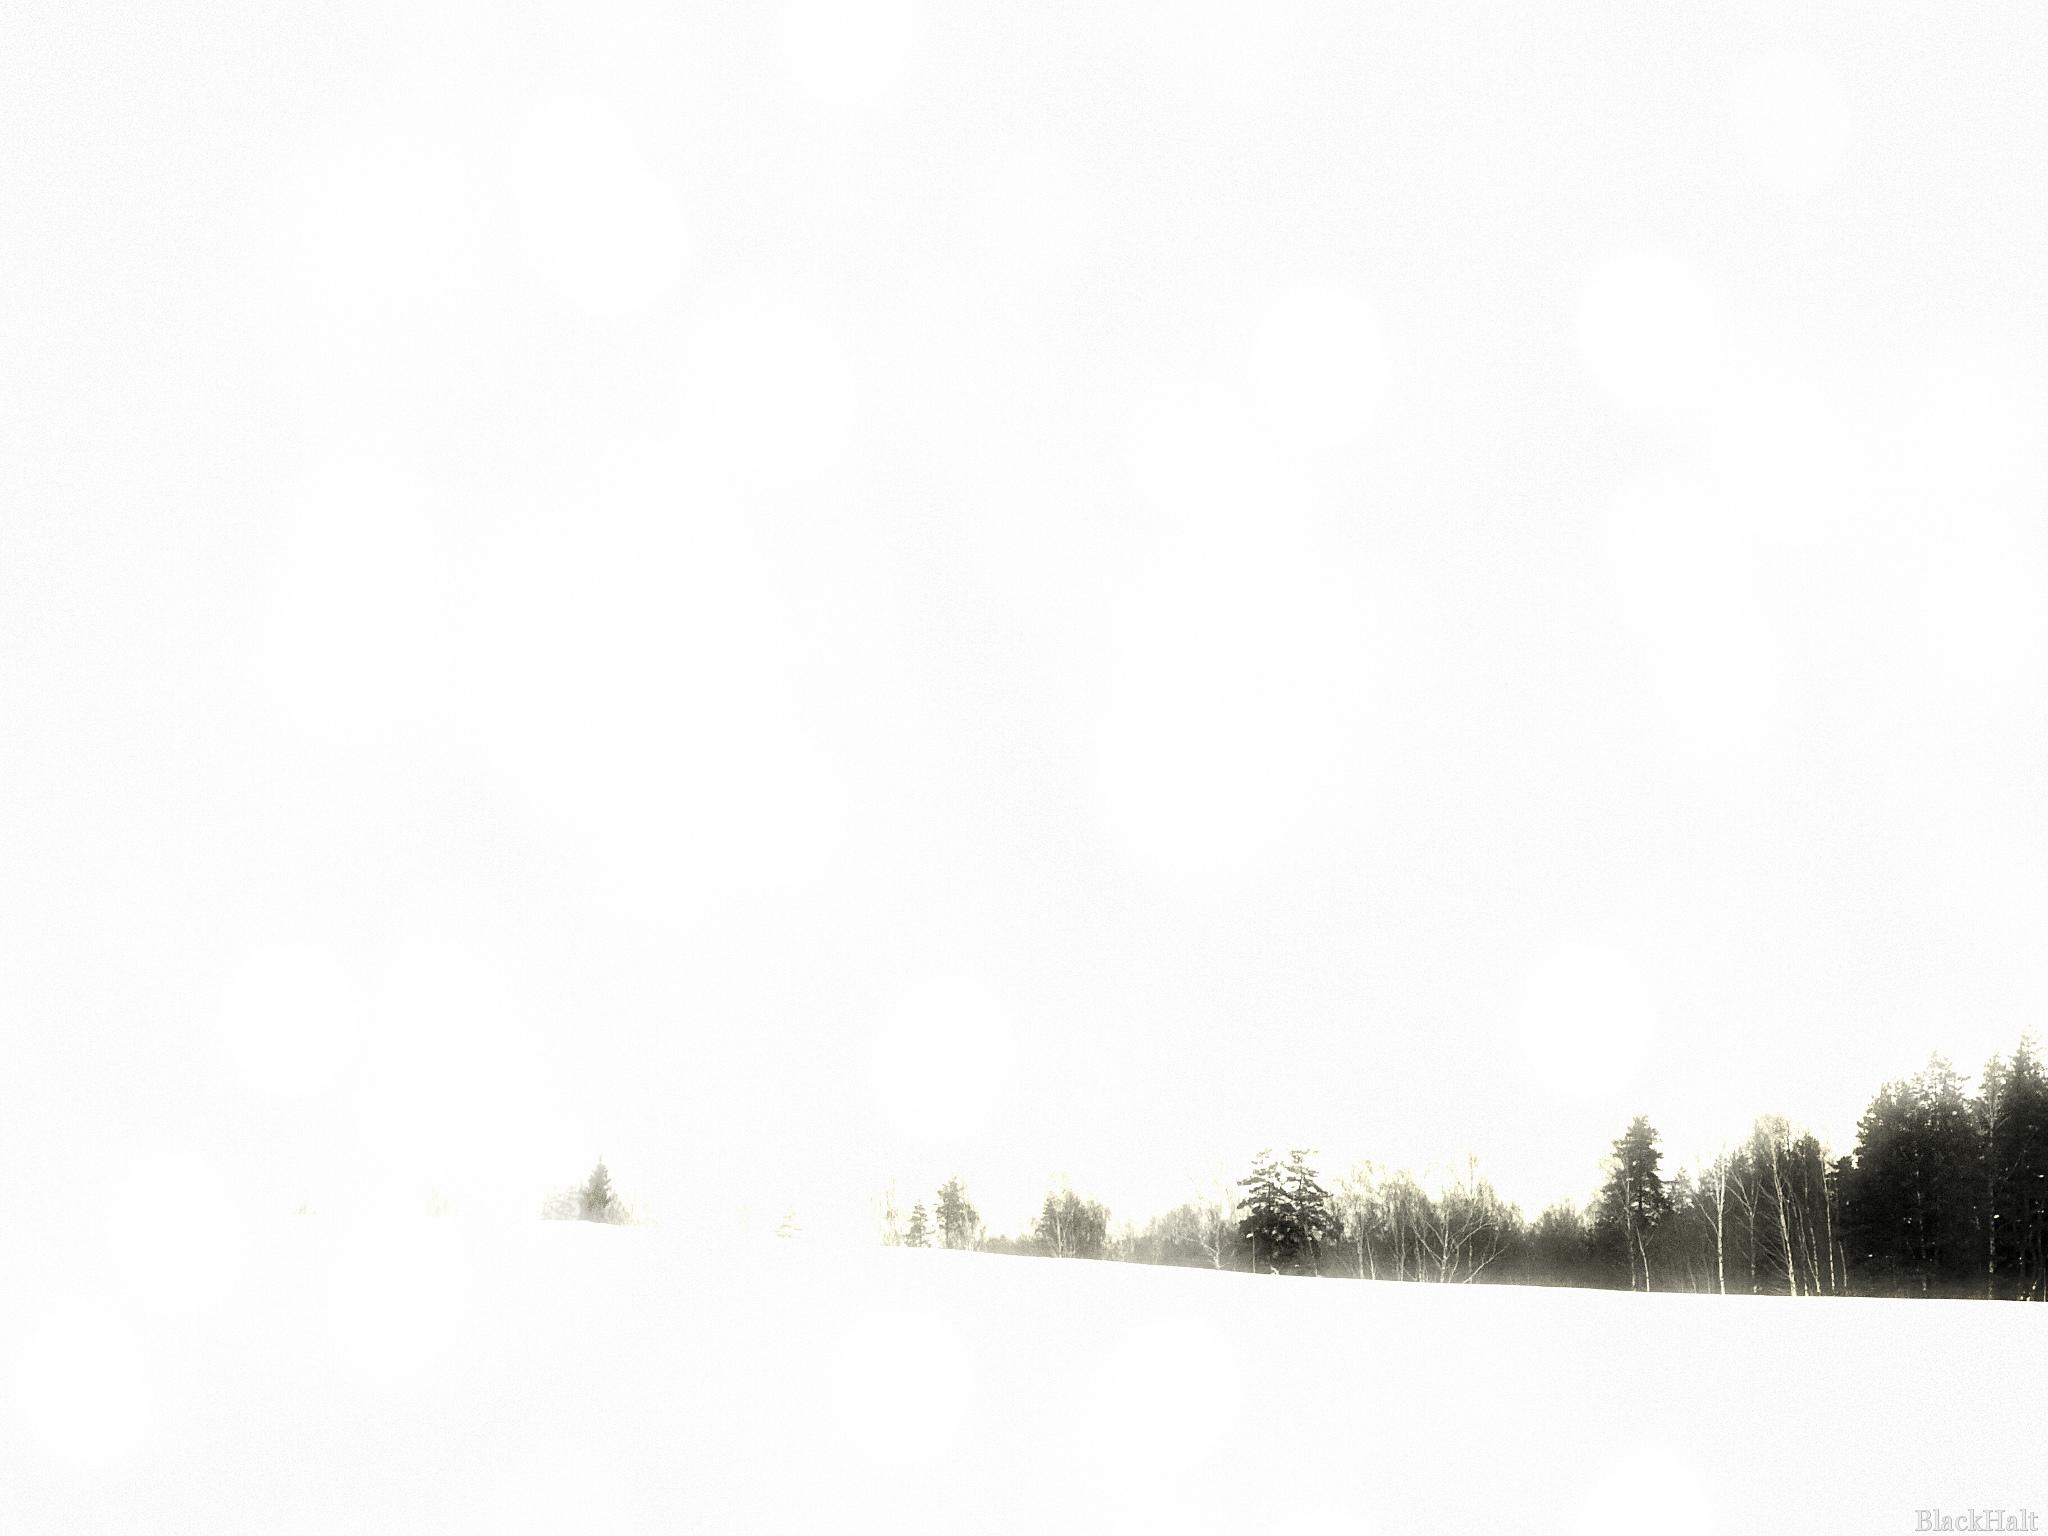 Balts balts